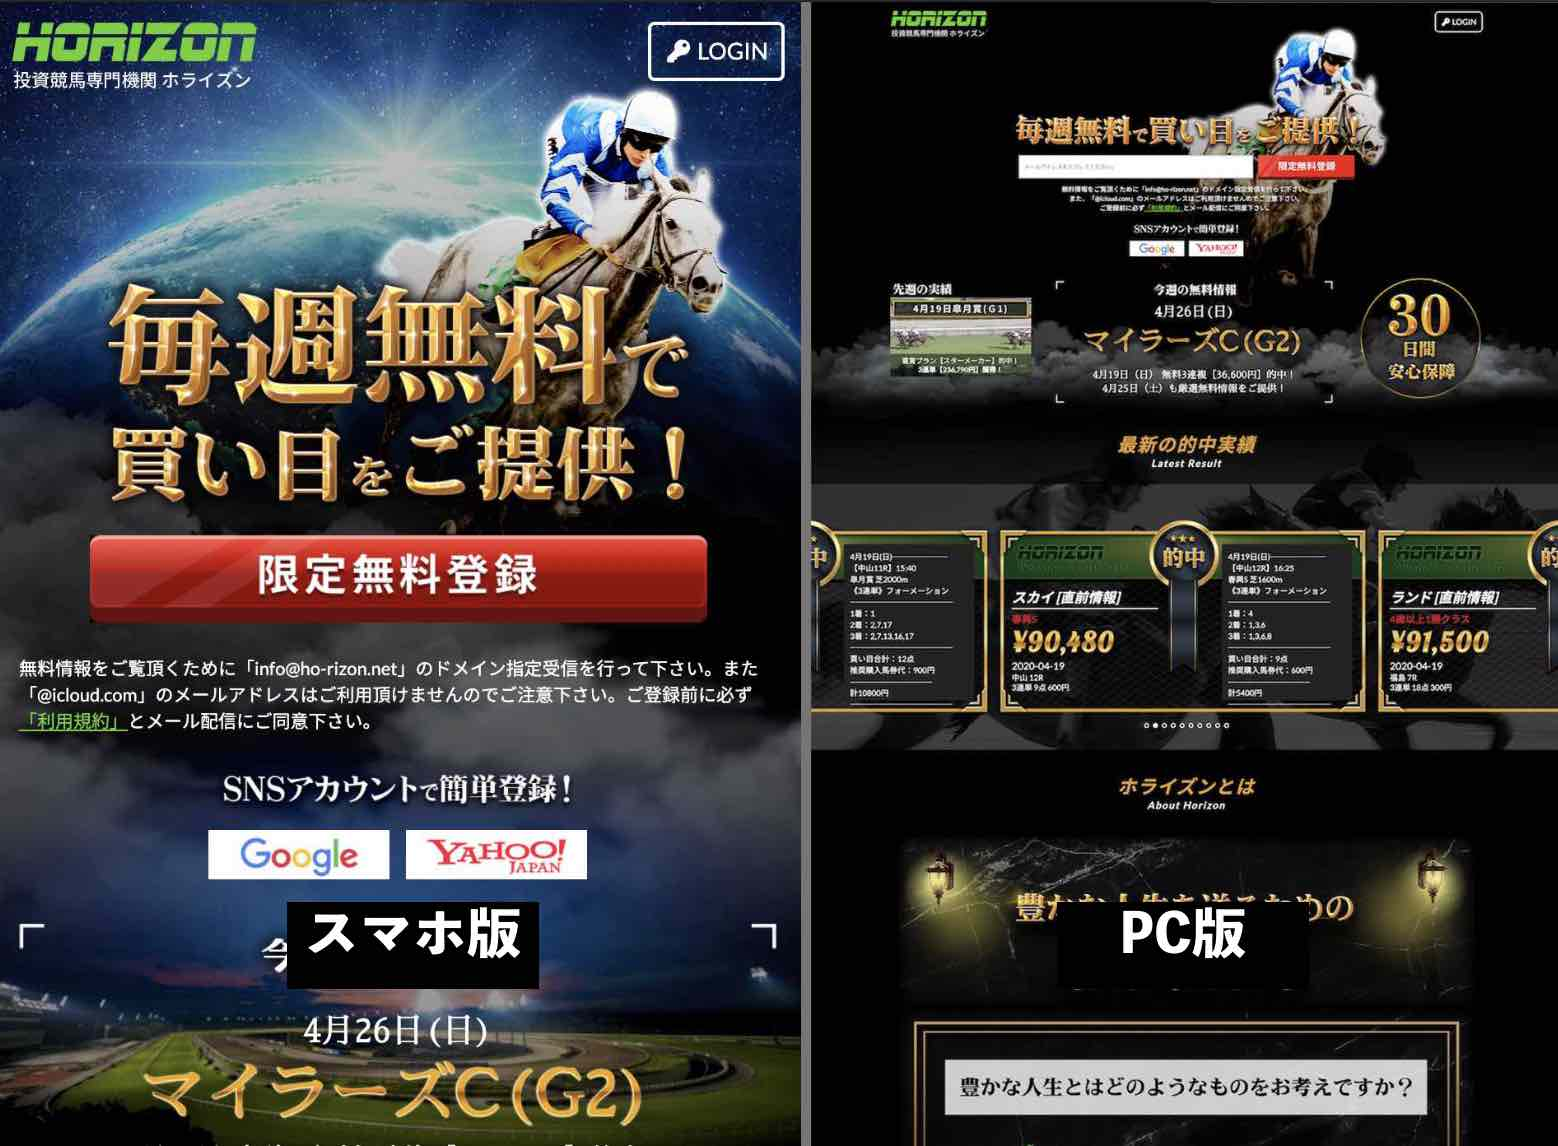 HORIZON(ホライズン)という競馬予想サイトのPC版とスマホ版